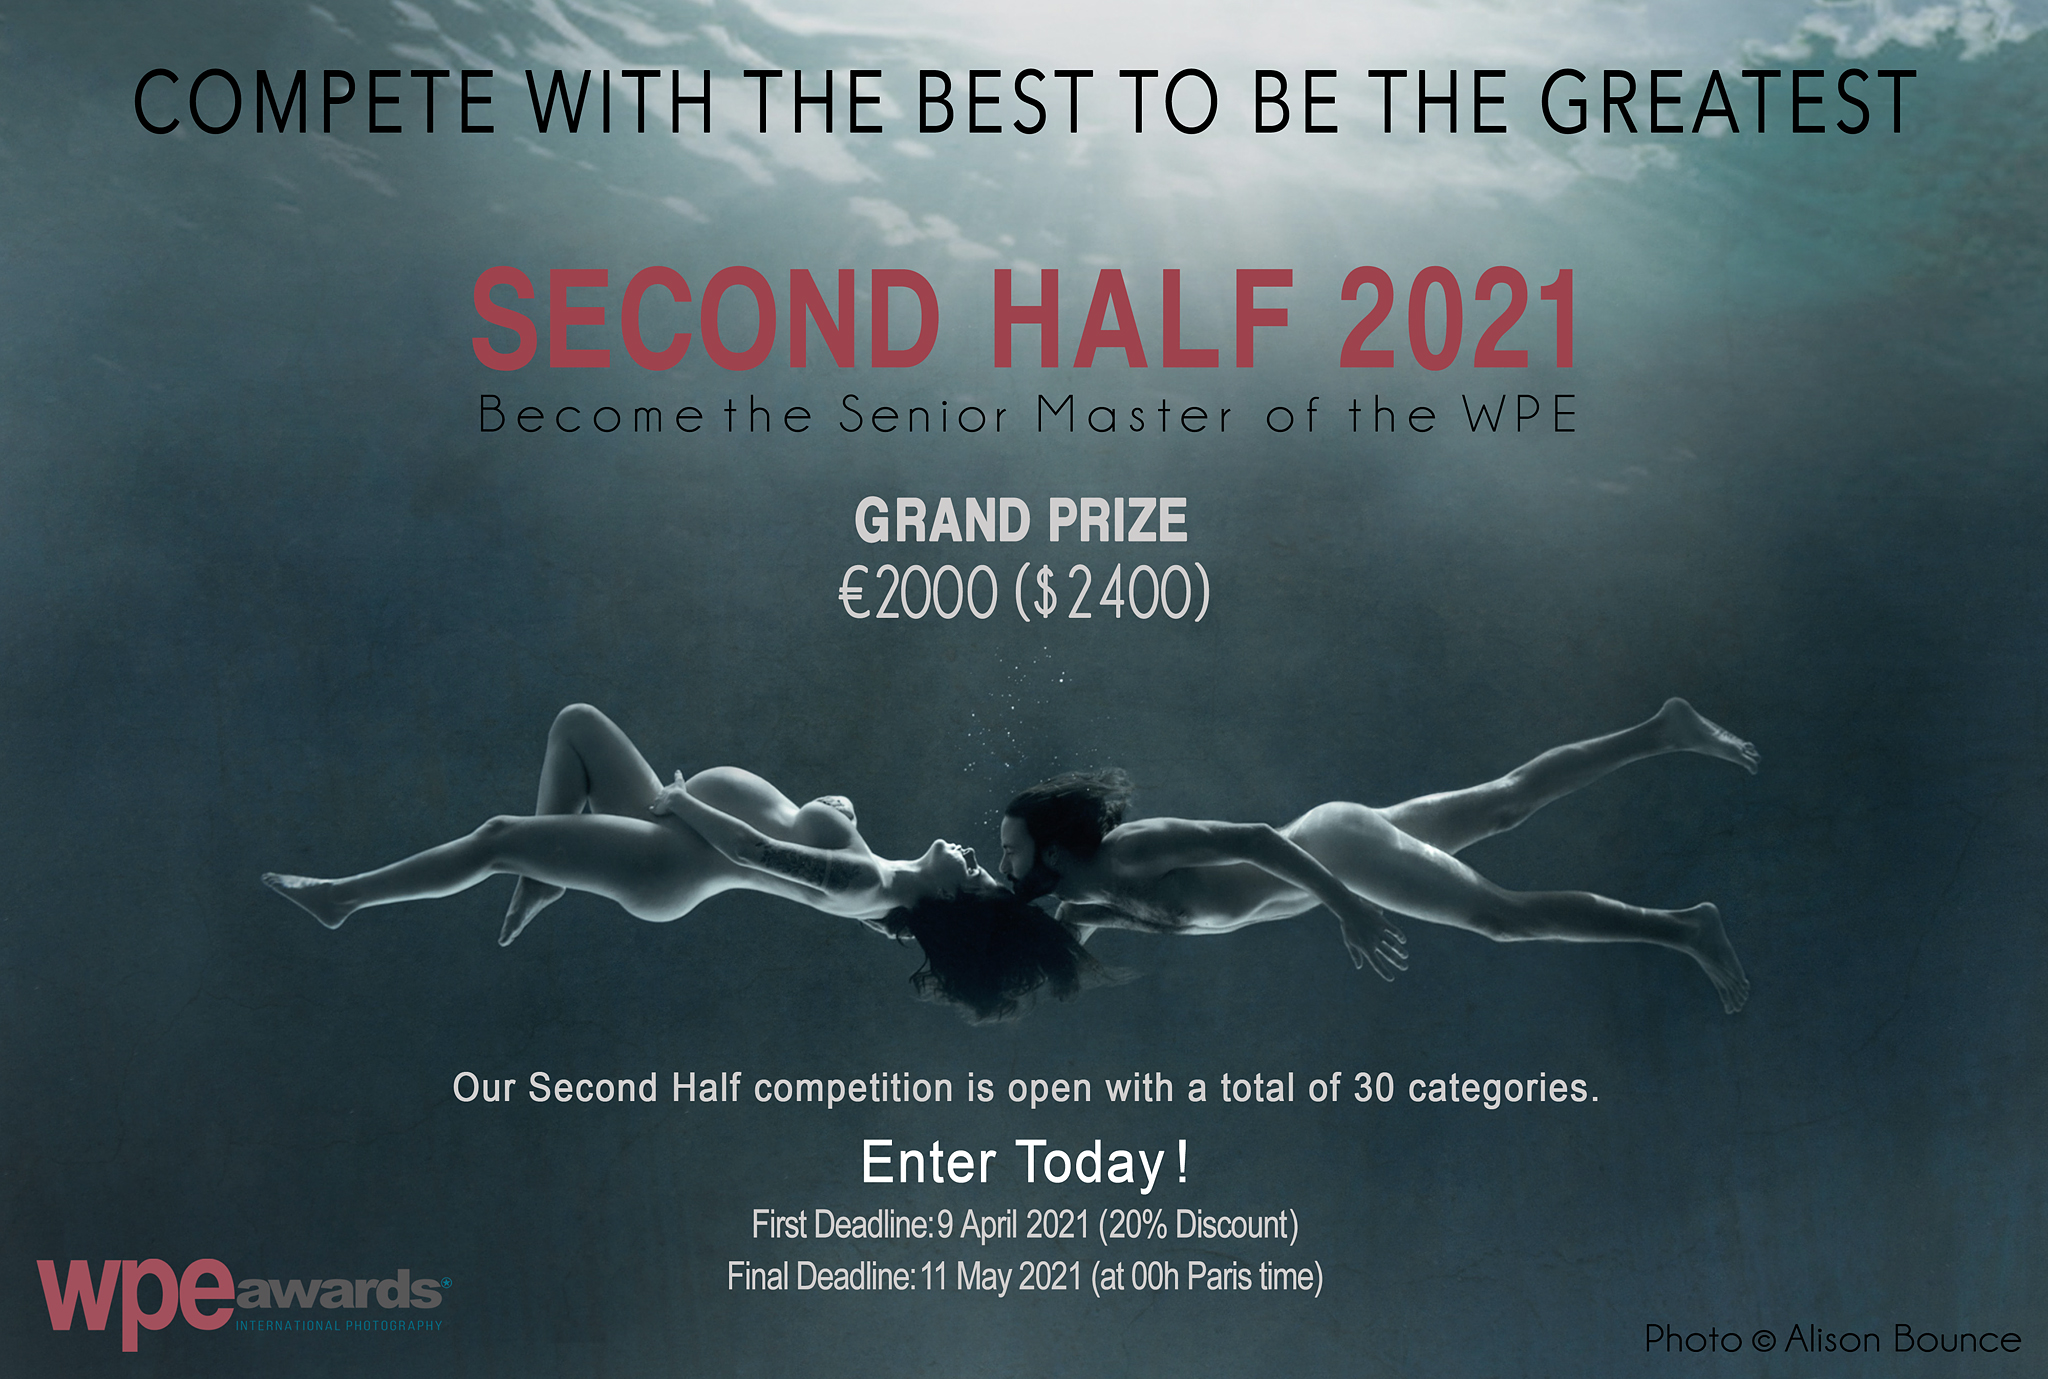 WPE SECOND HALF 2021